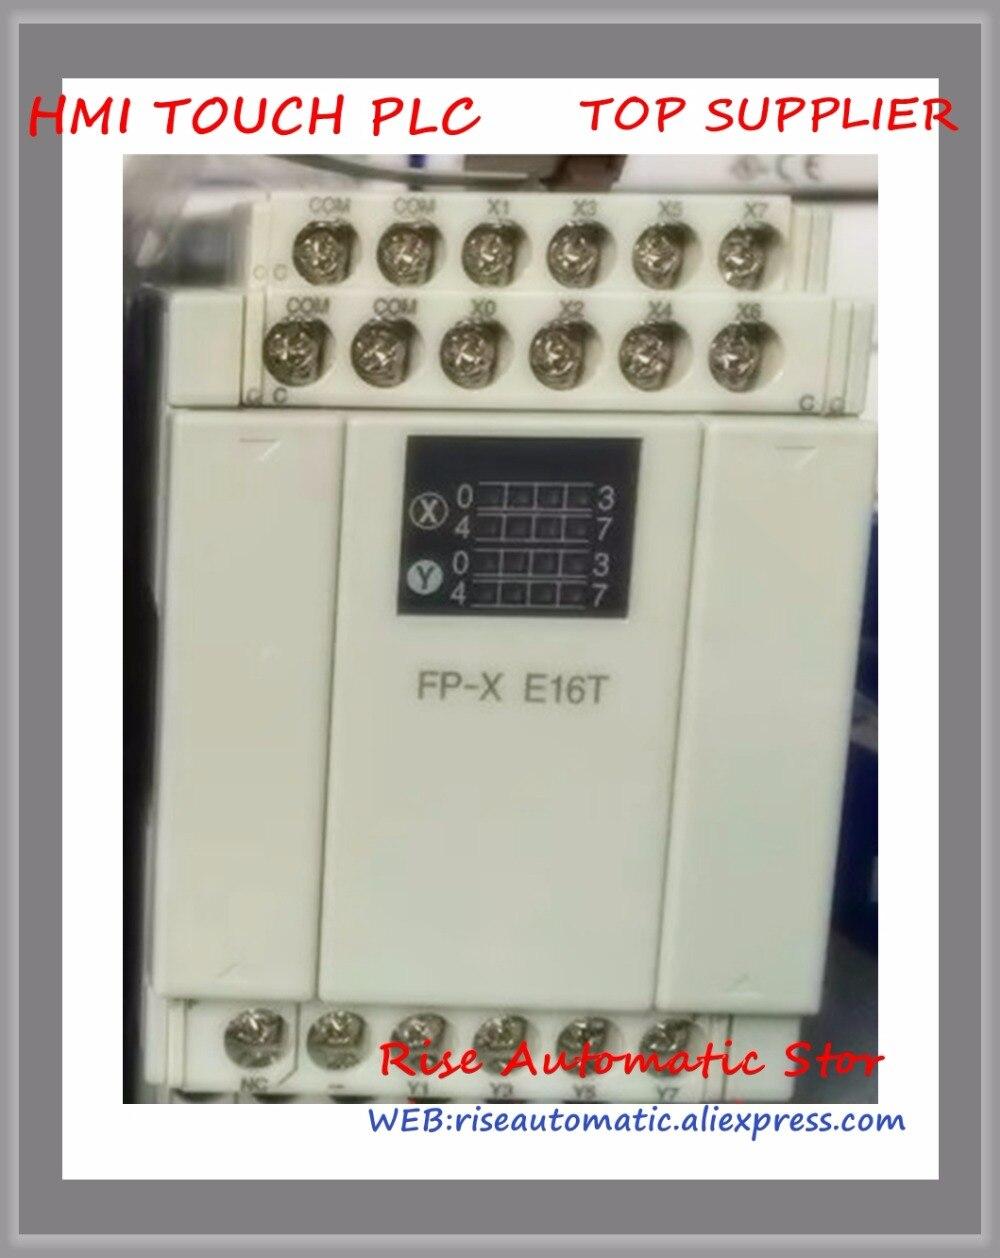 AFPX-E14YR PLC 2A Relay, 14 output points FP-X Expansion Unit New OriginalAFPX-E14YR PLC 2A Relay, 14 output points FP-X Expansion Unit New Original